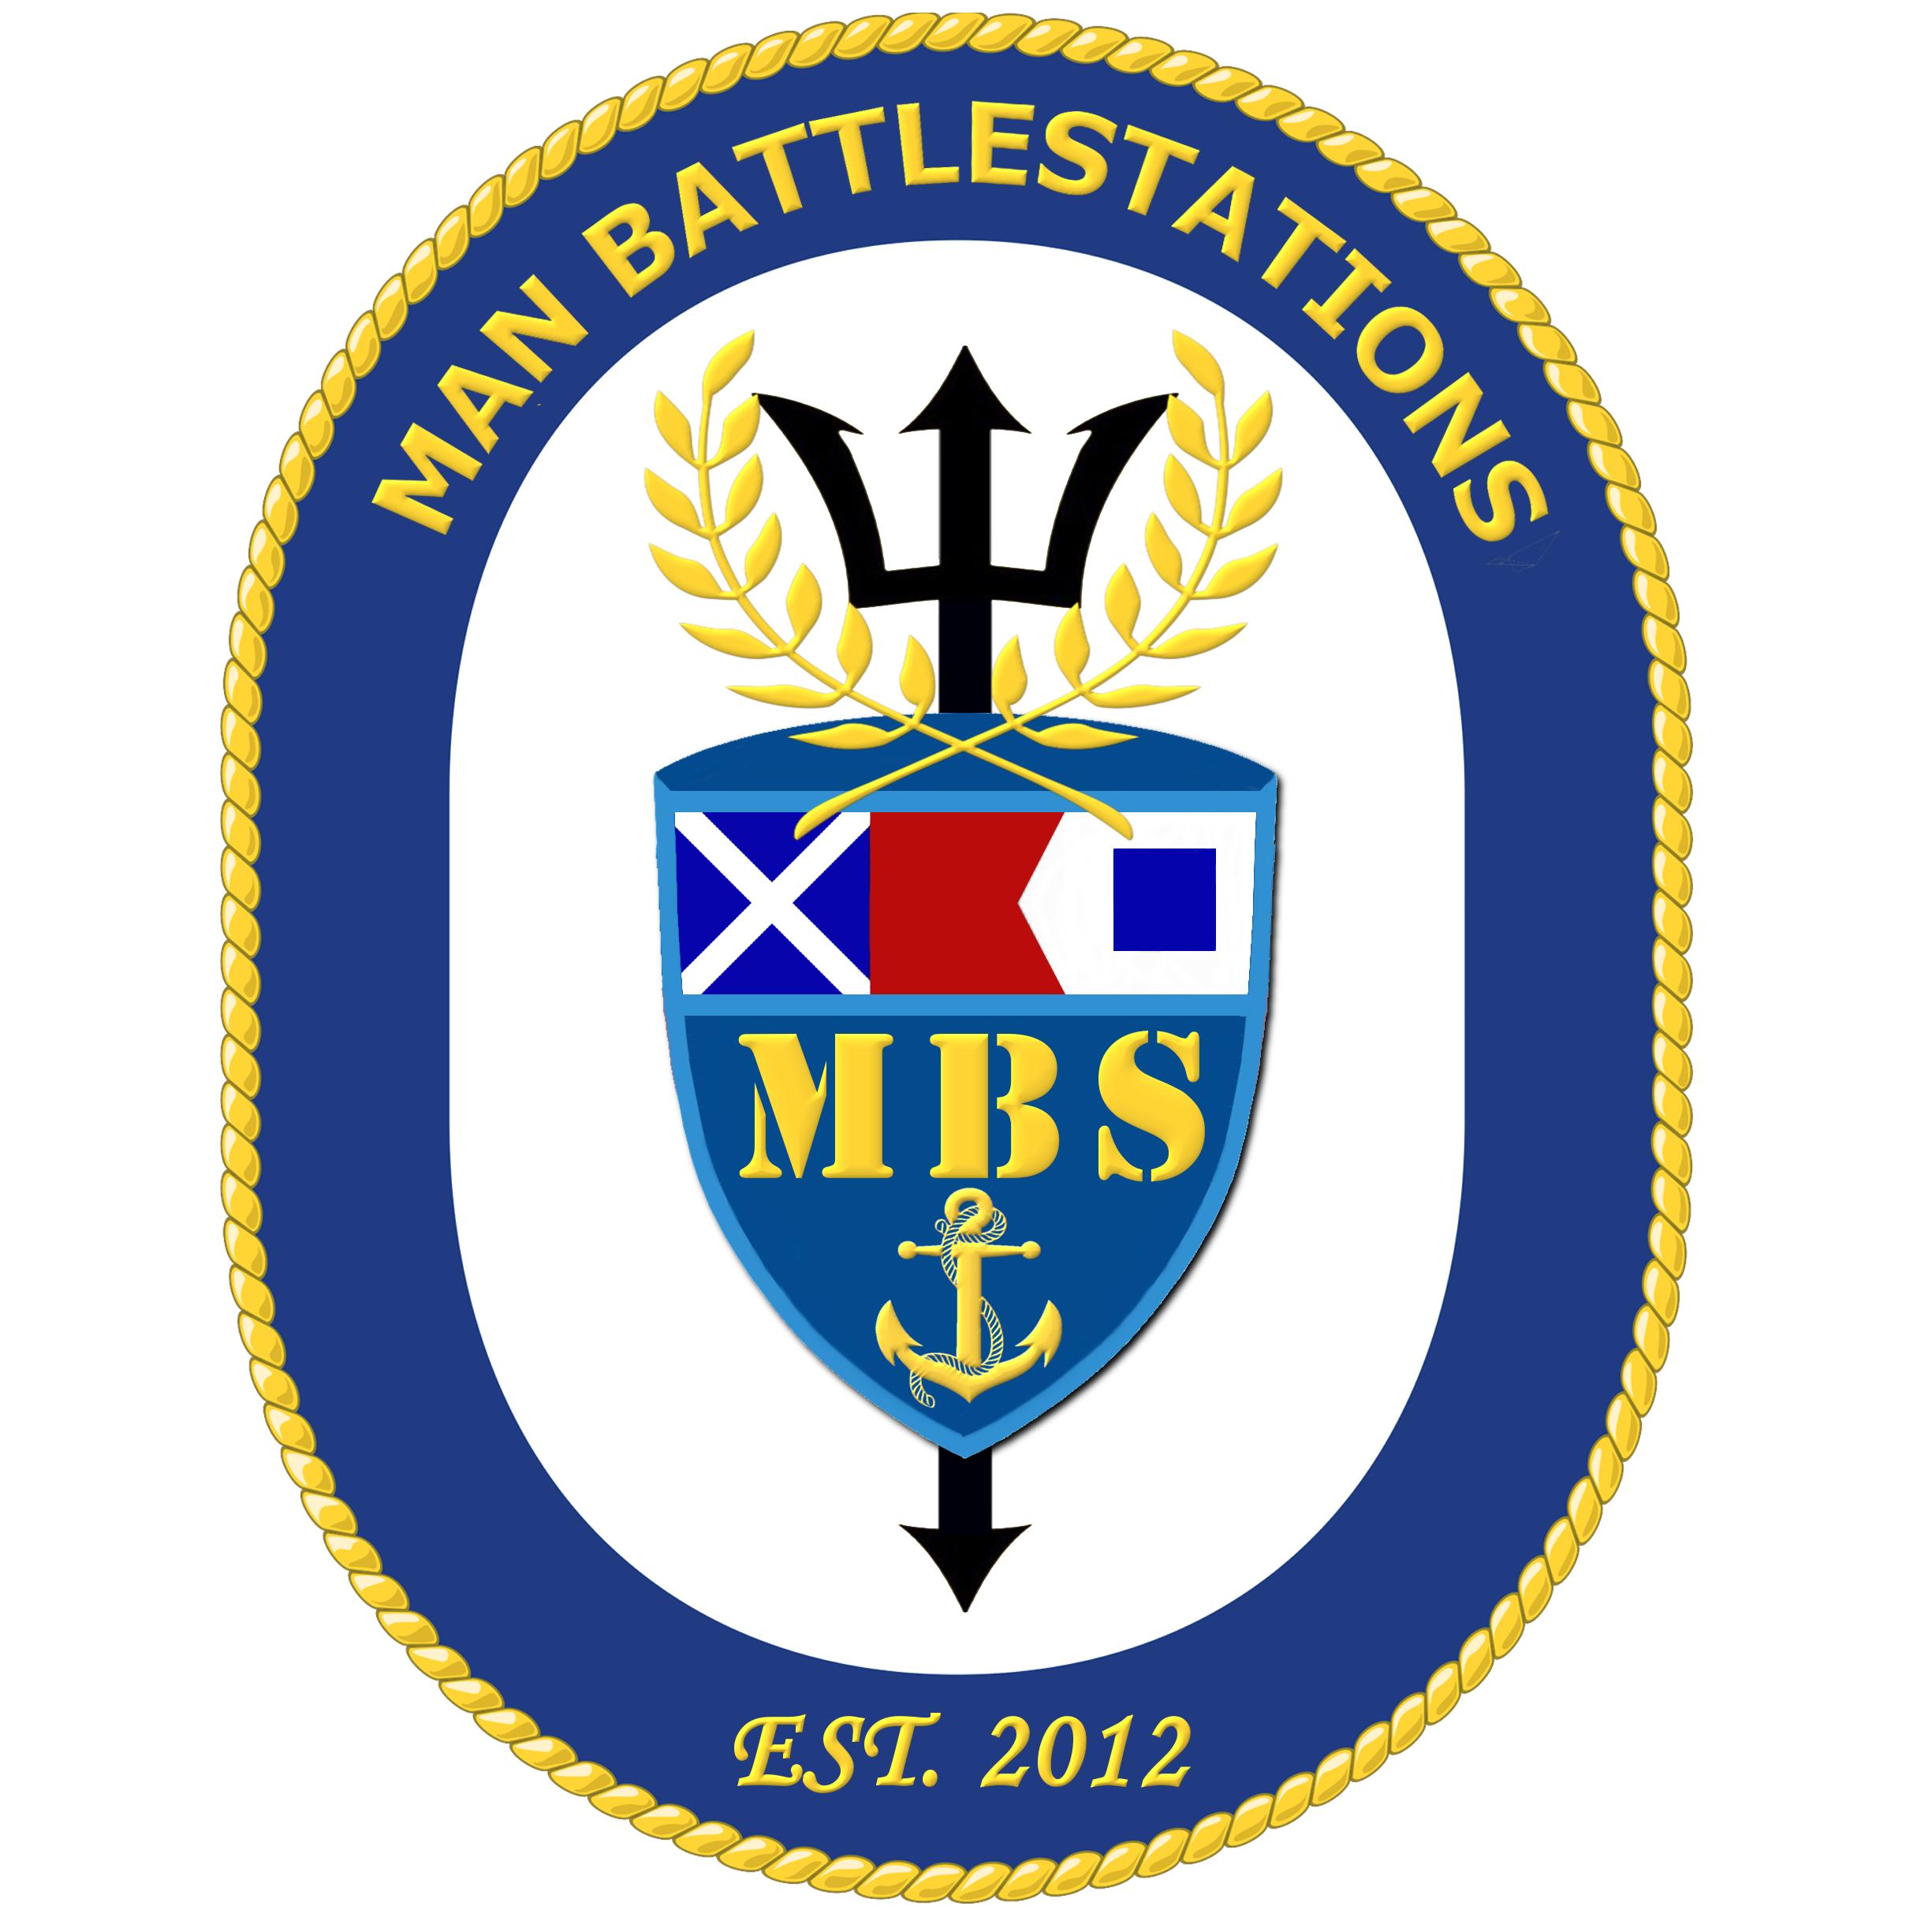 The Man Battlestations Podcast show art